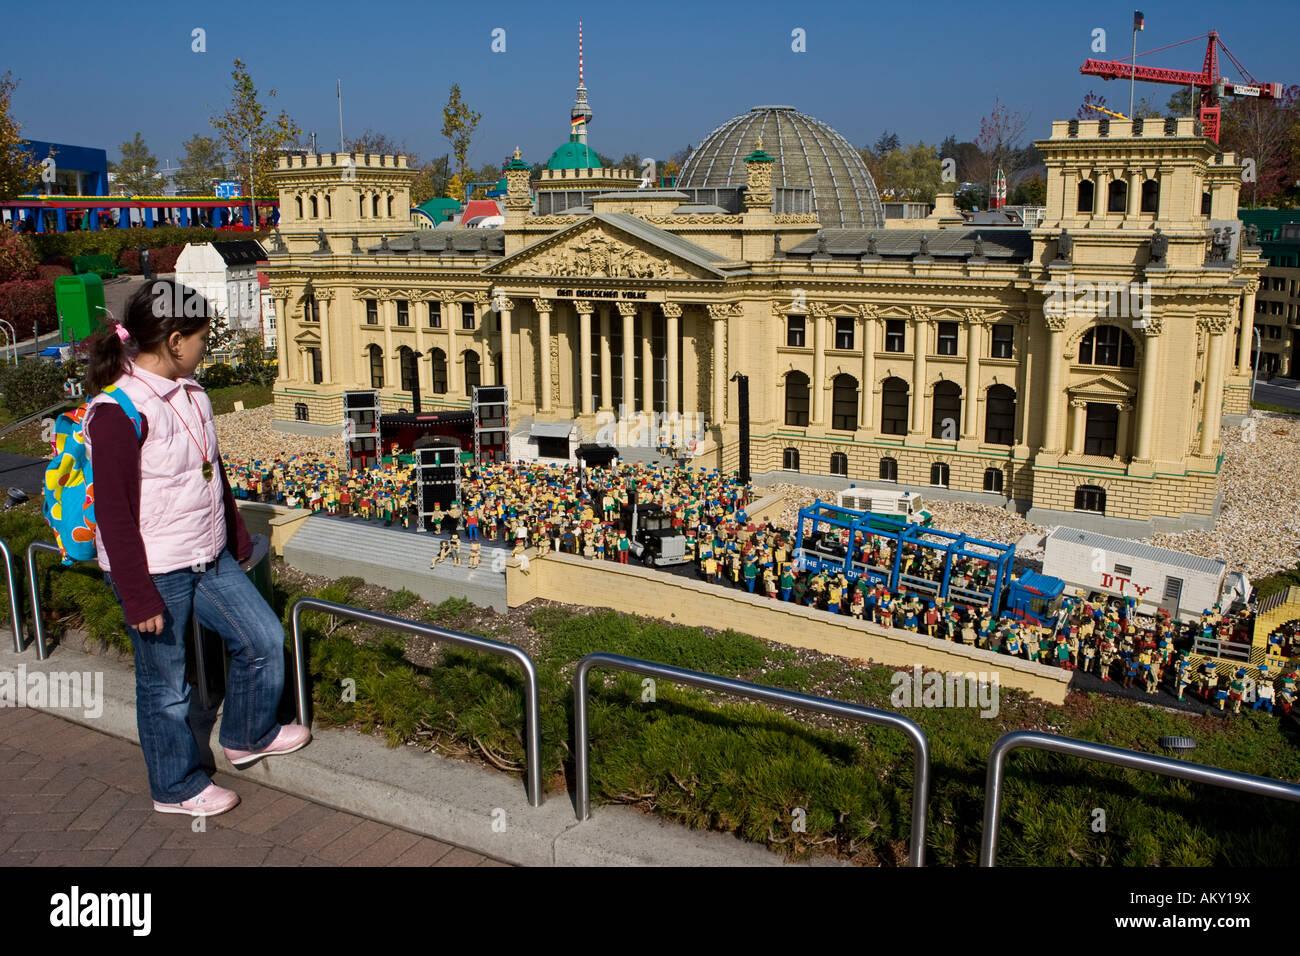 Model of berlin legoland guenzburg bavaria germany stock photo royalty free image 15094021 - Mobeltown berlin ...